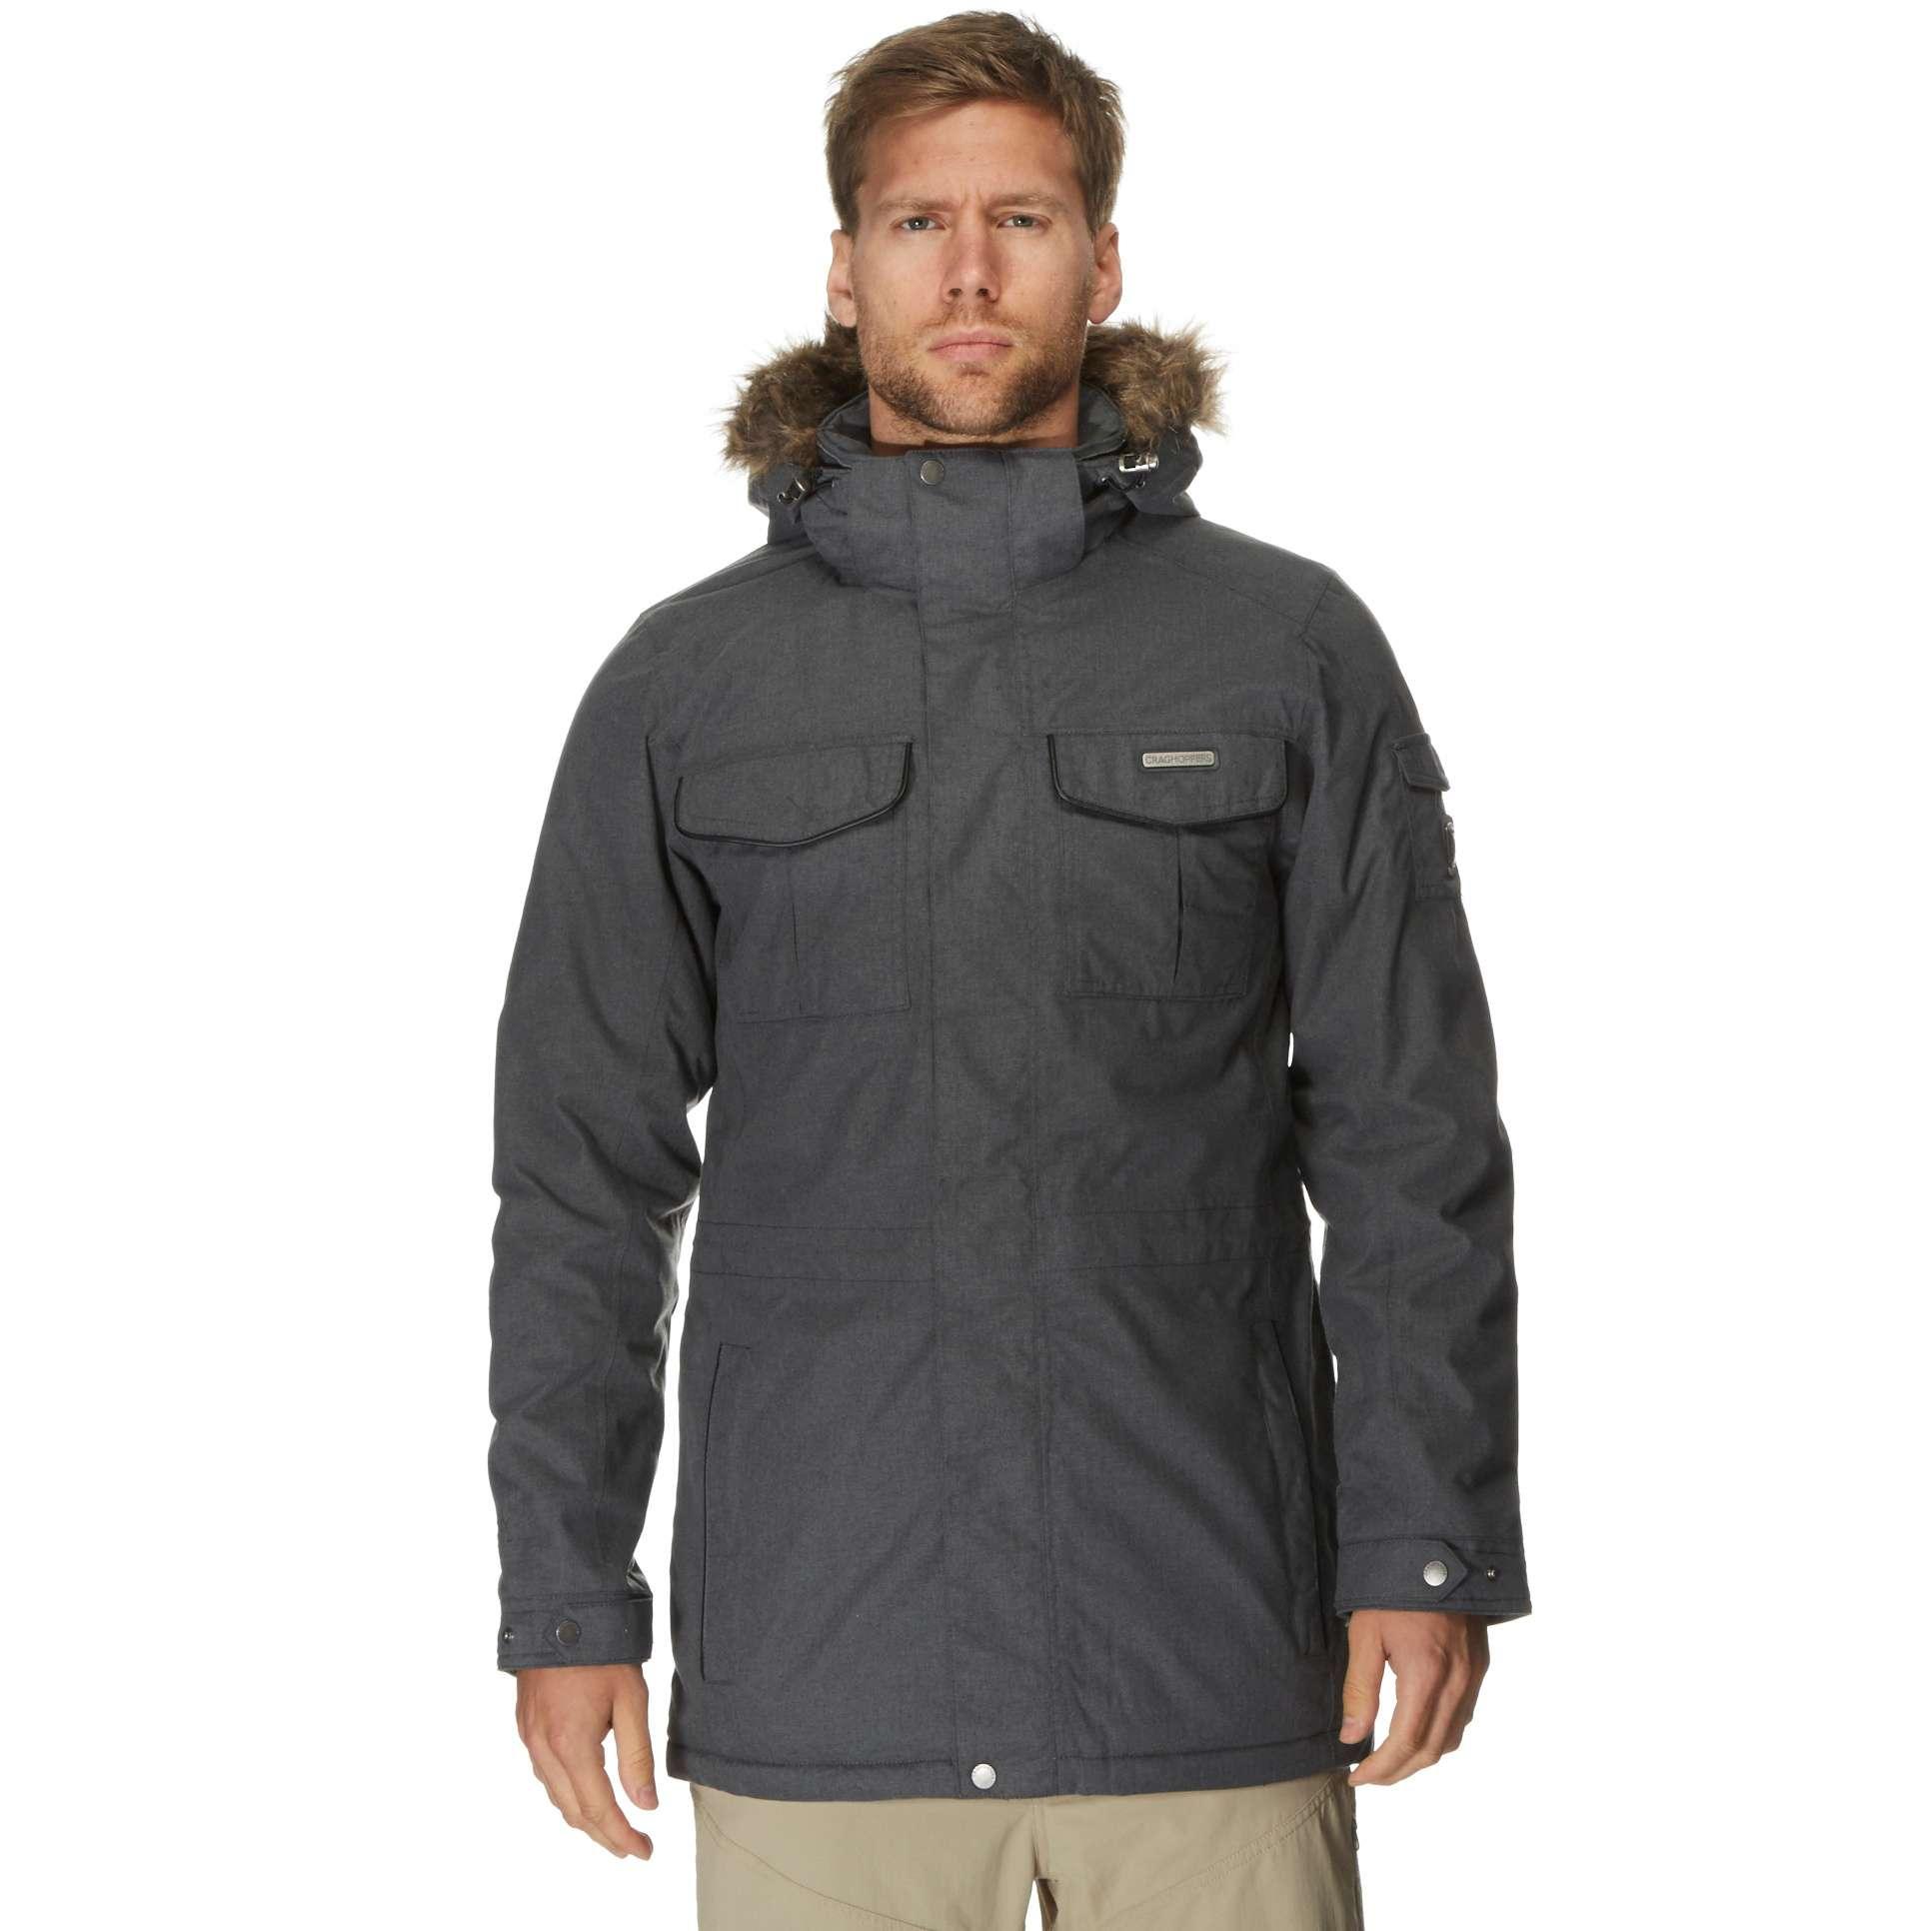 CRAGHOPPERS Men's Coverdale Jacket